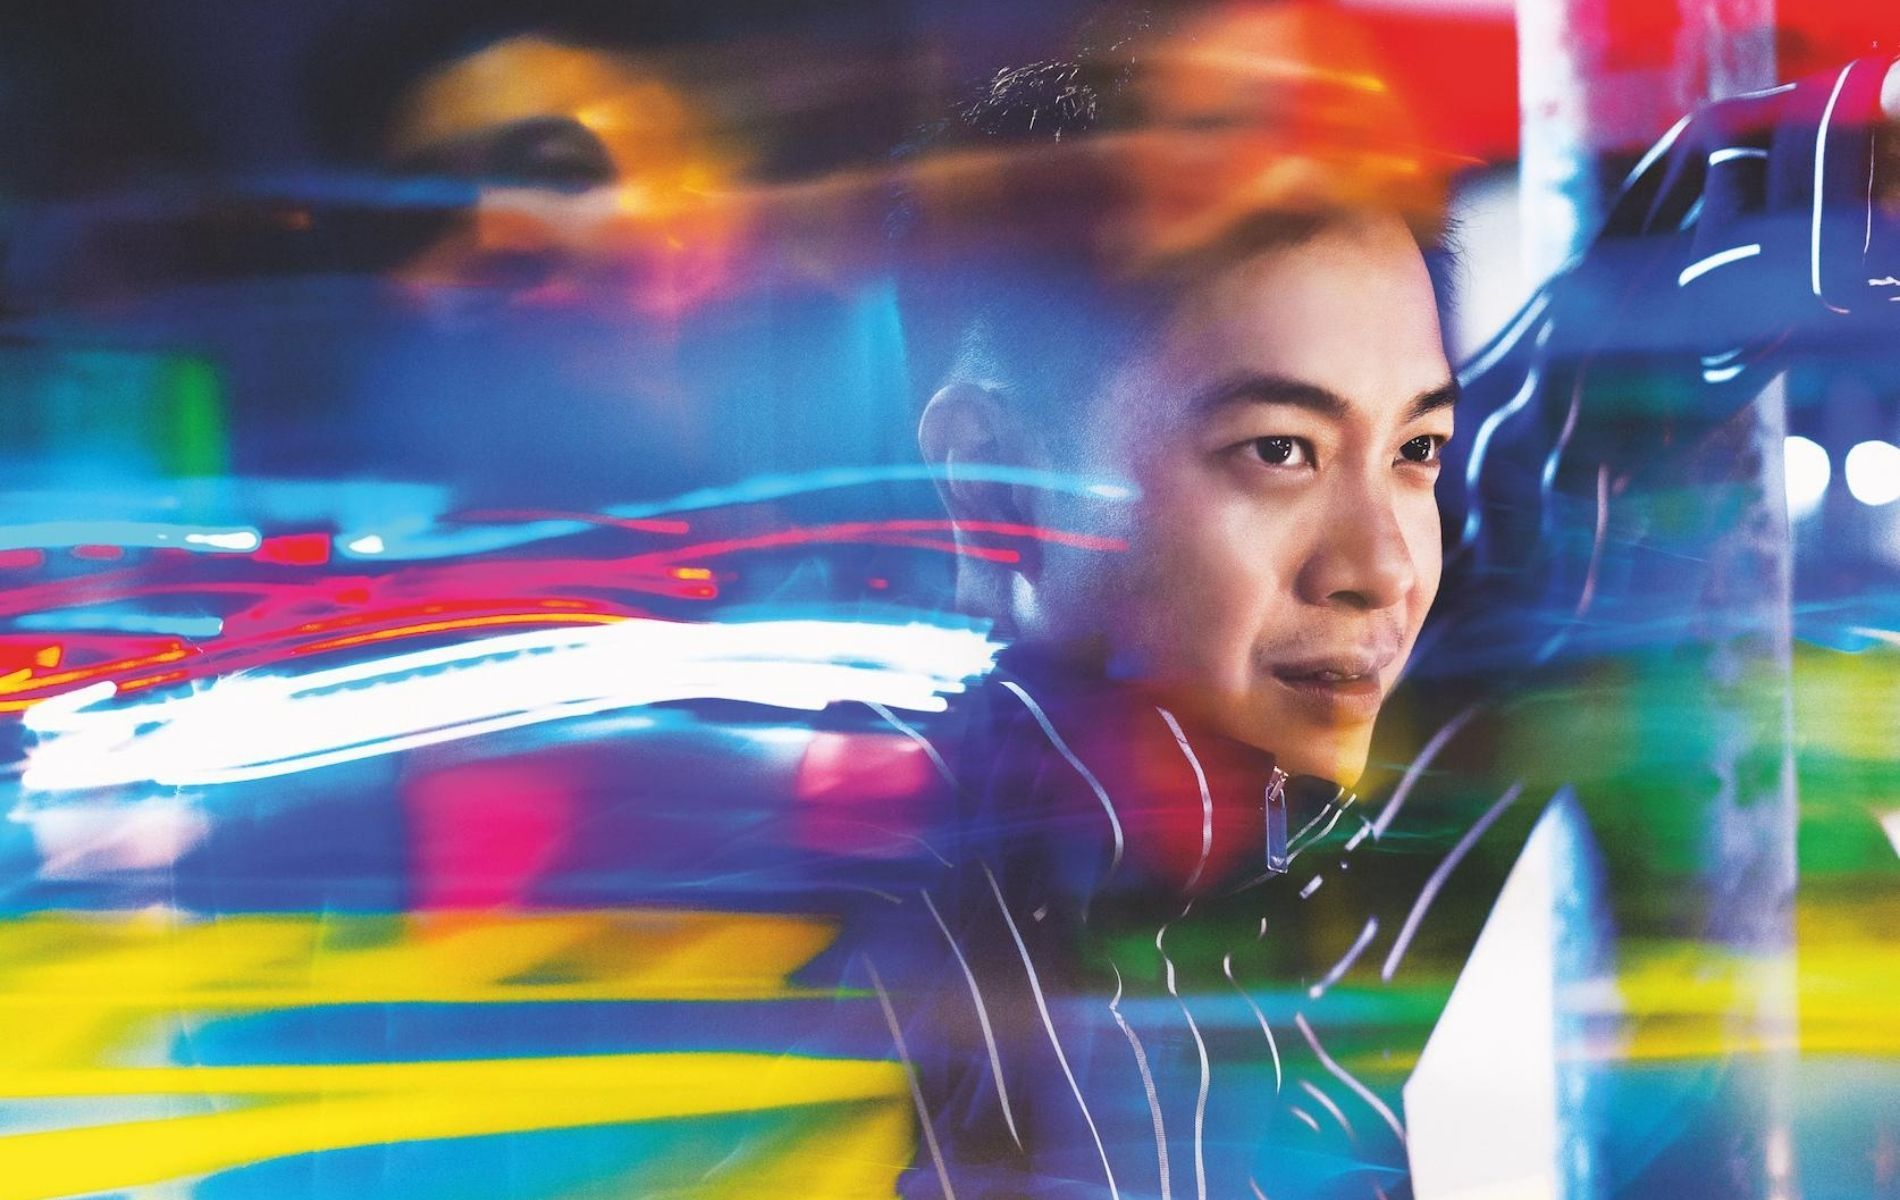 Director Quek Shio Chuan Tells Deeply Personal Stories Through His Films